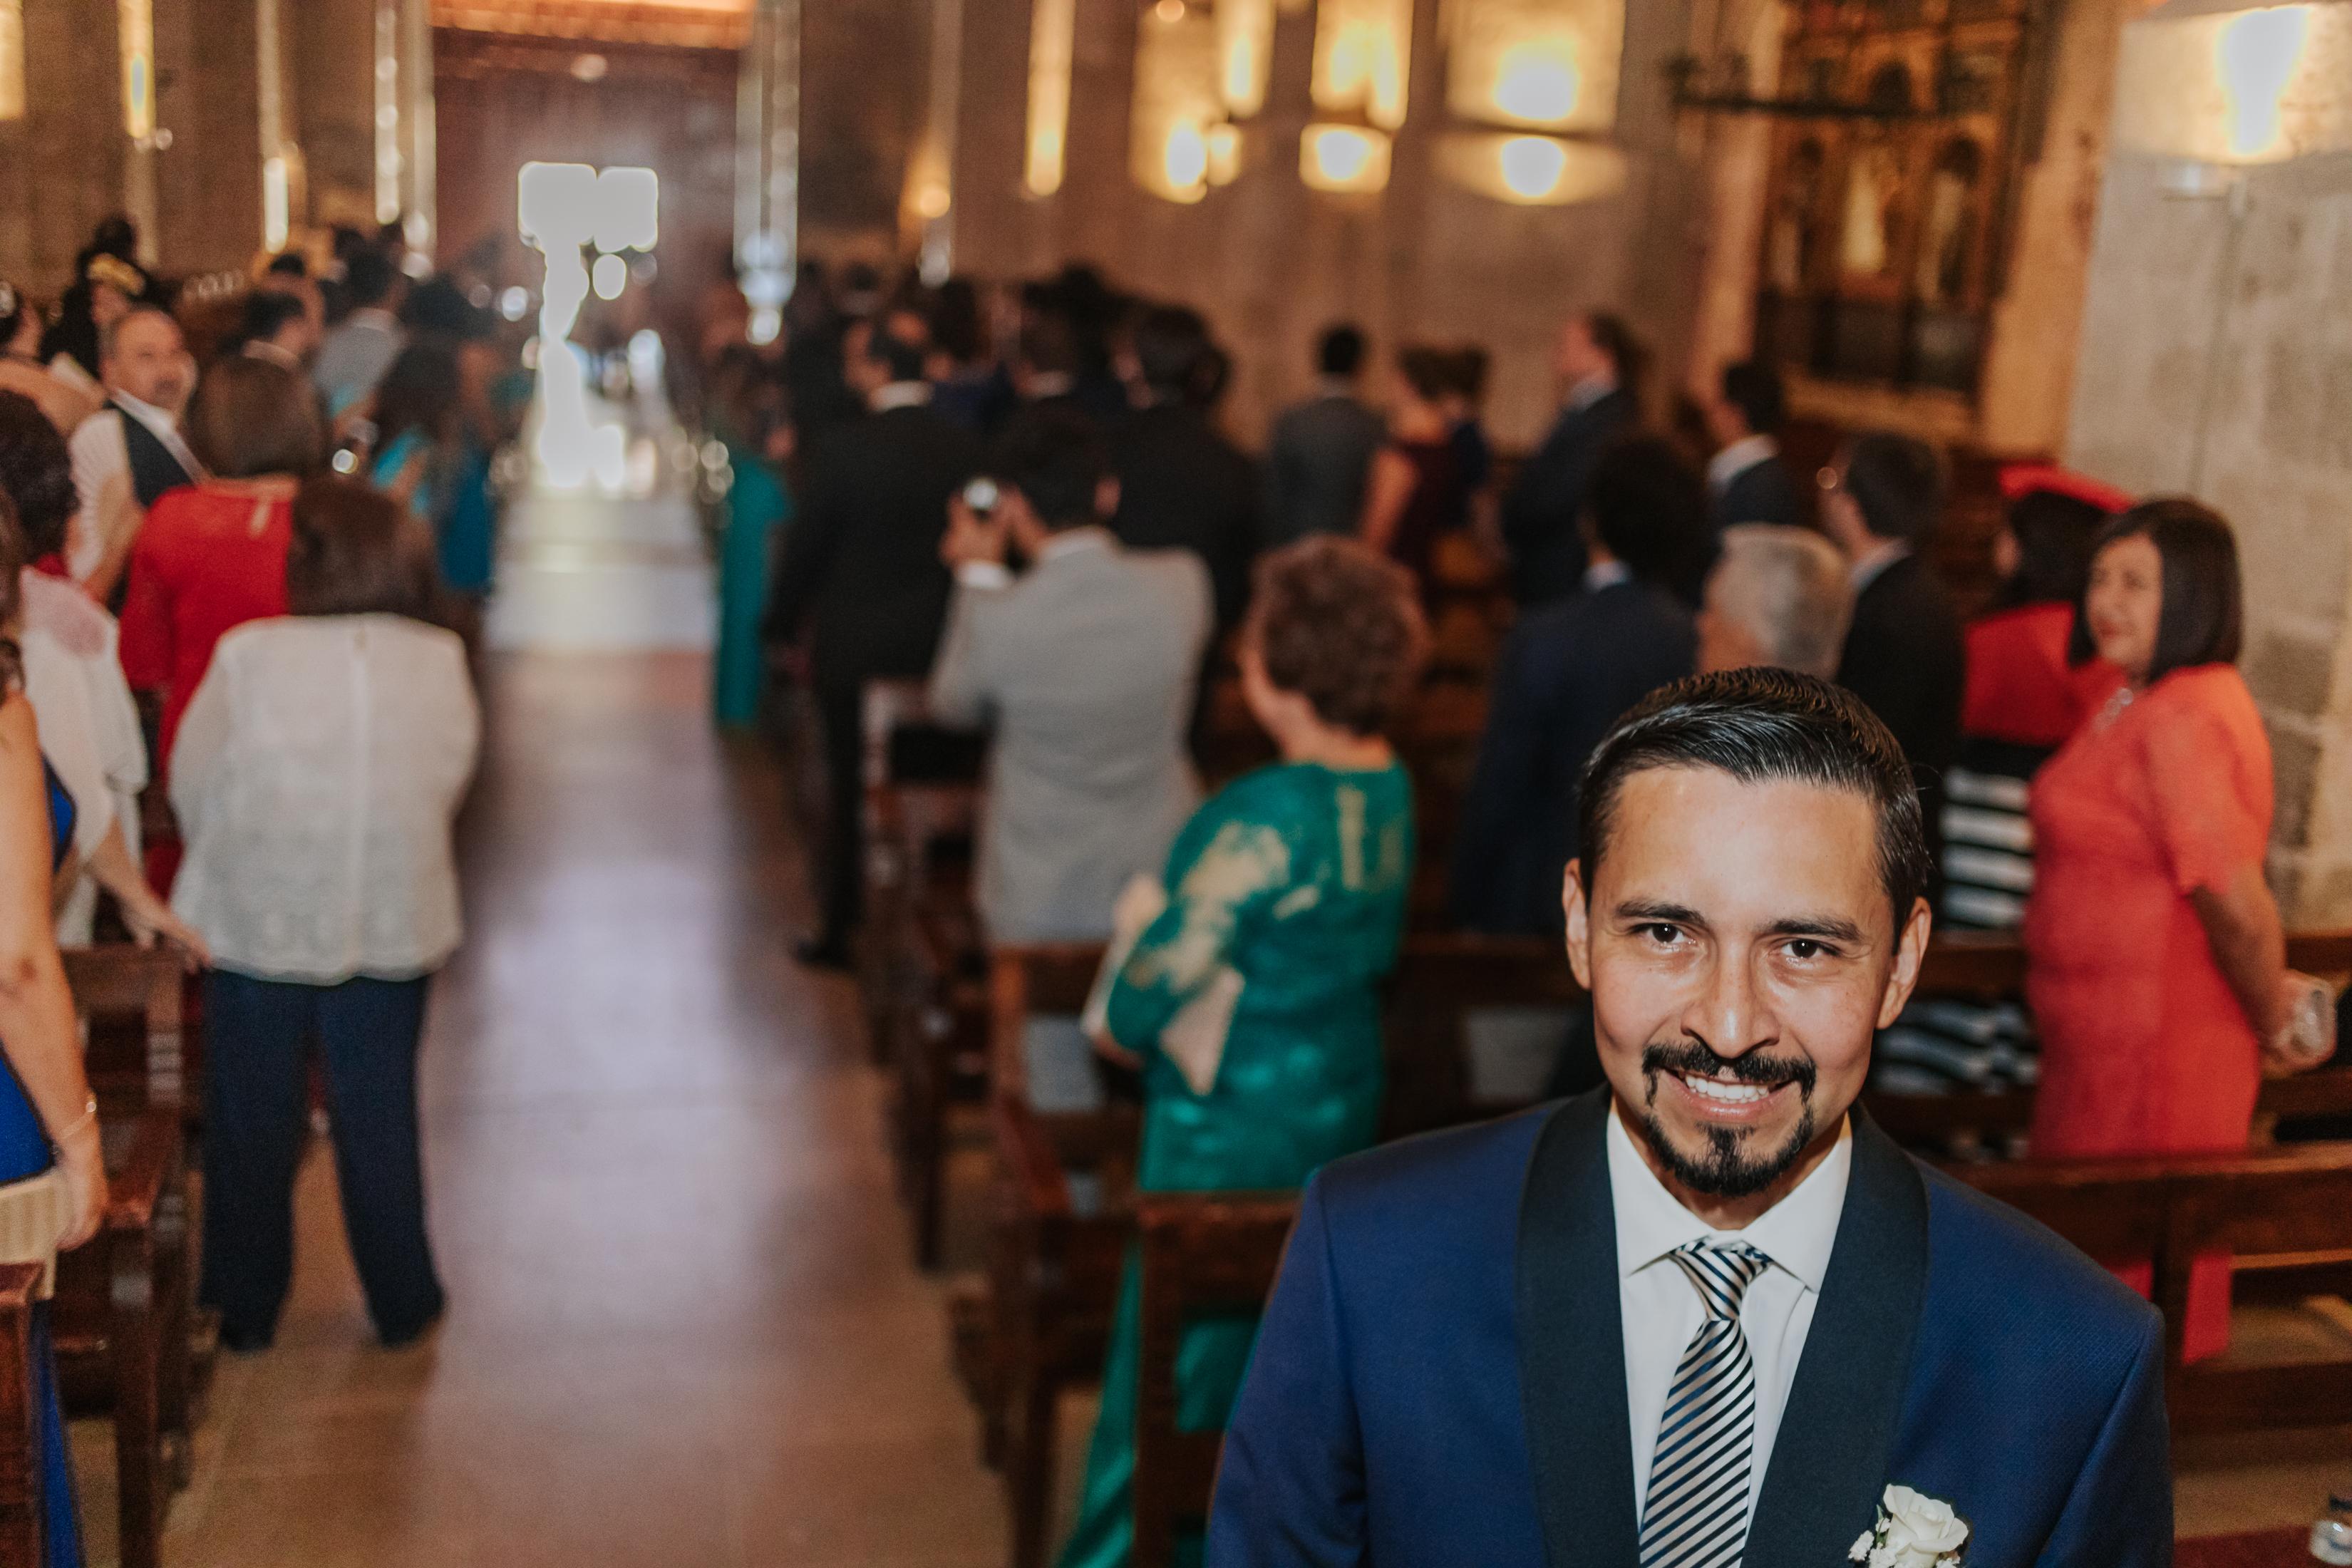 Fotógrafo de bodas Barcelona :: Fotógrafo de bodas Sant Cugat :: Barcelona Wedding Photographer :: Sant Cugat wedding photographer :: Boda en la Masía de Sant Cugat :: Boda Monasterio Sant Cugat